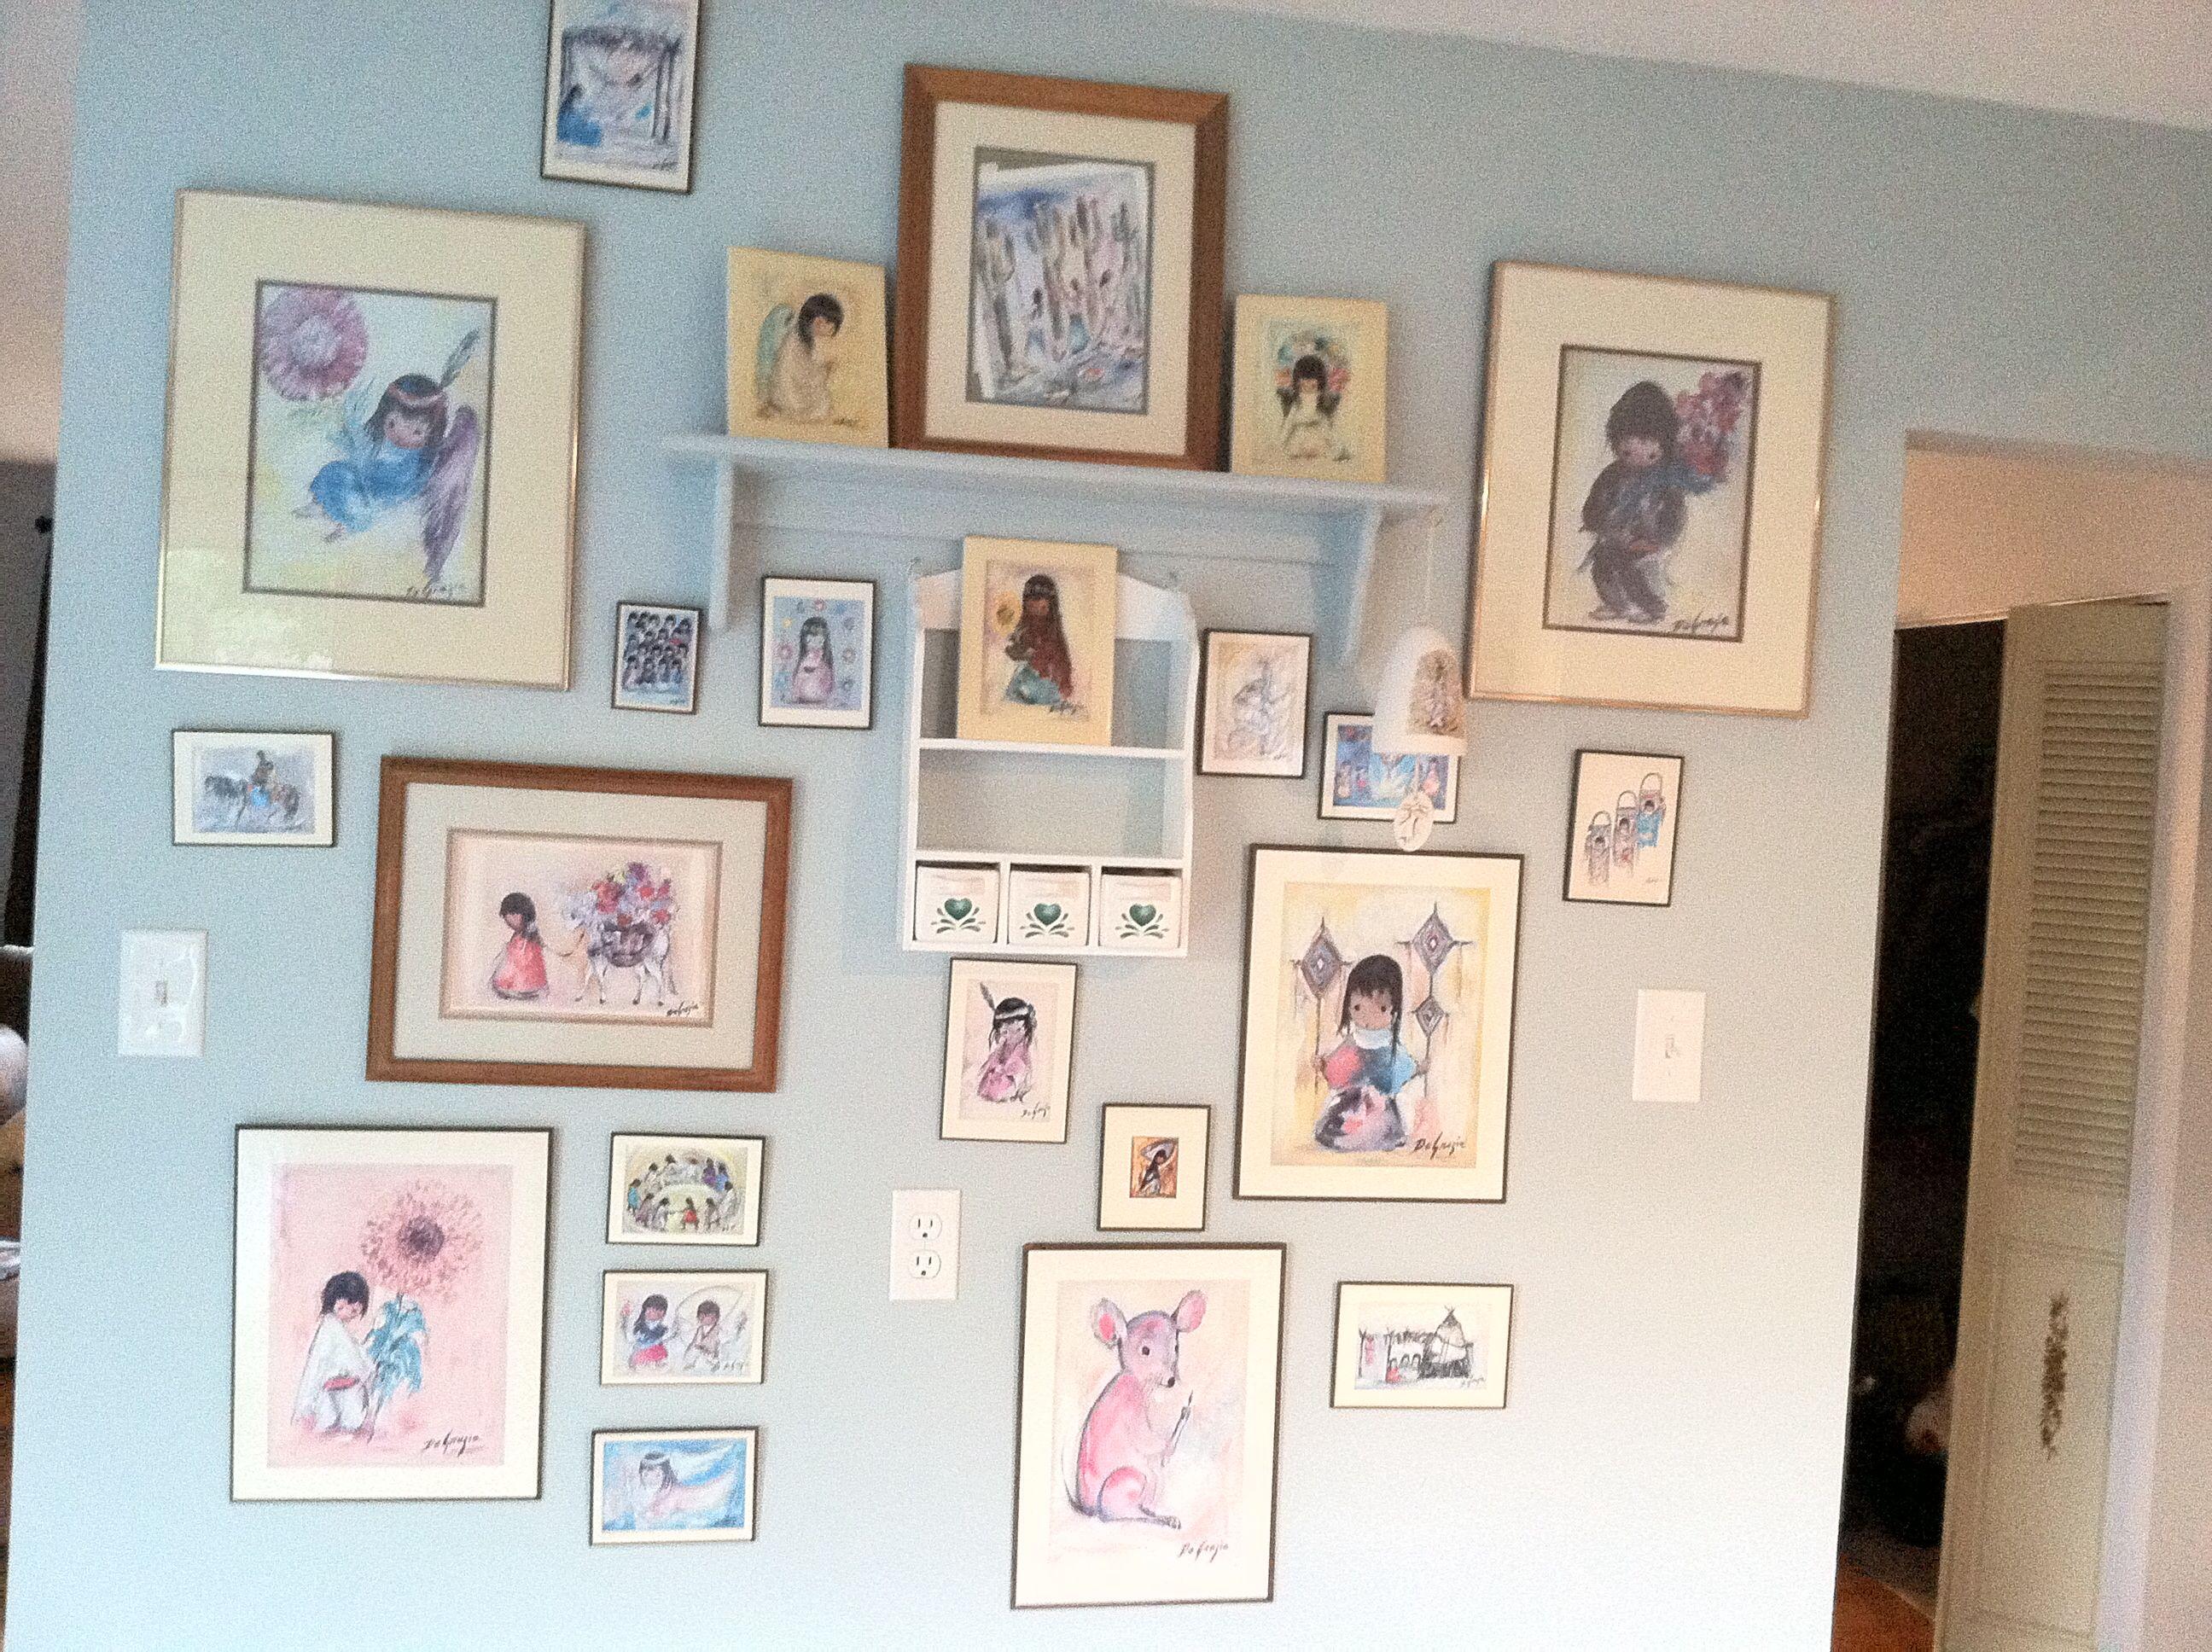 Gallery Wall Degrazia In My Kitchen Home Decor Pinterest